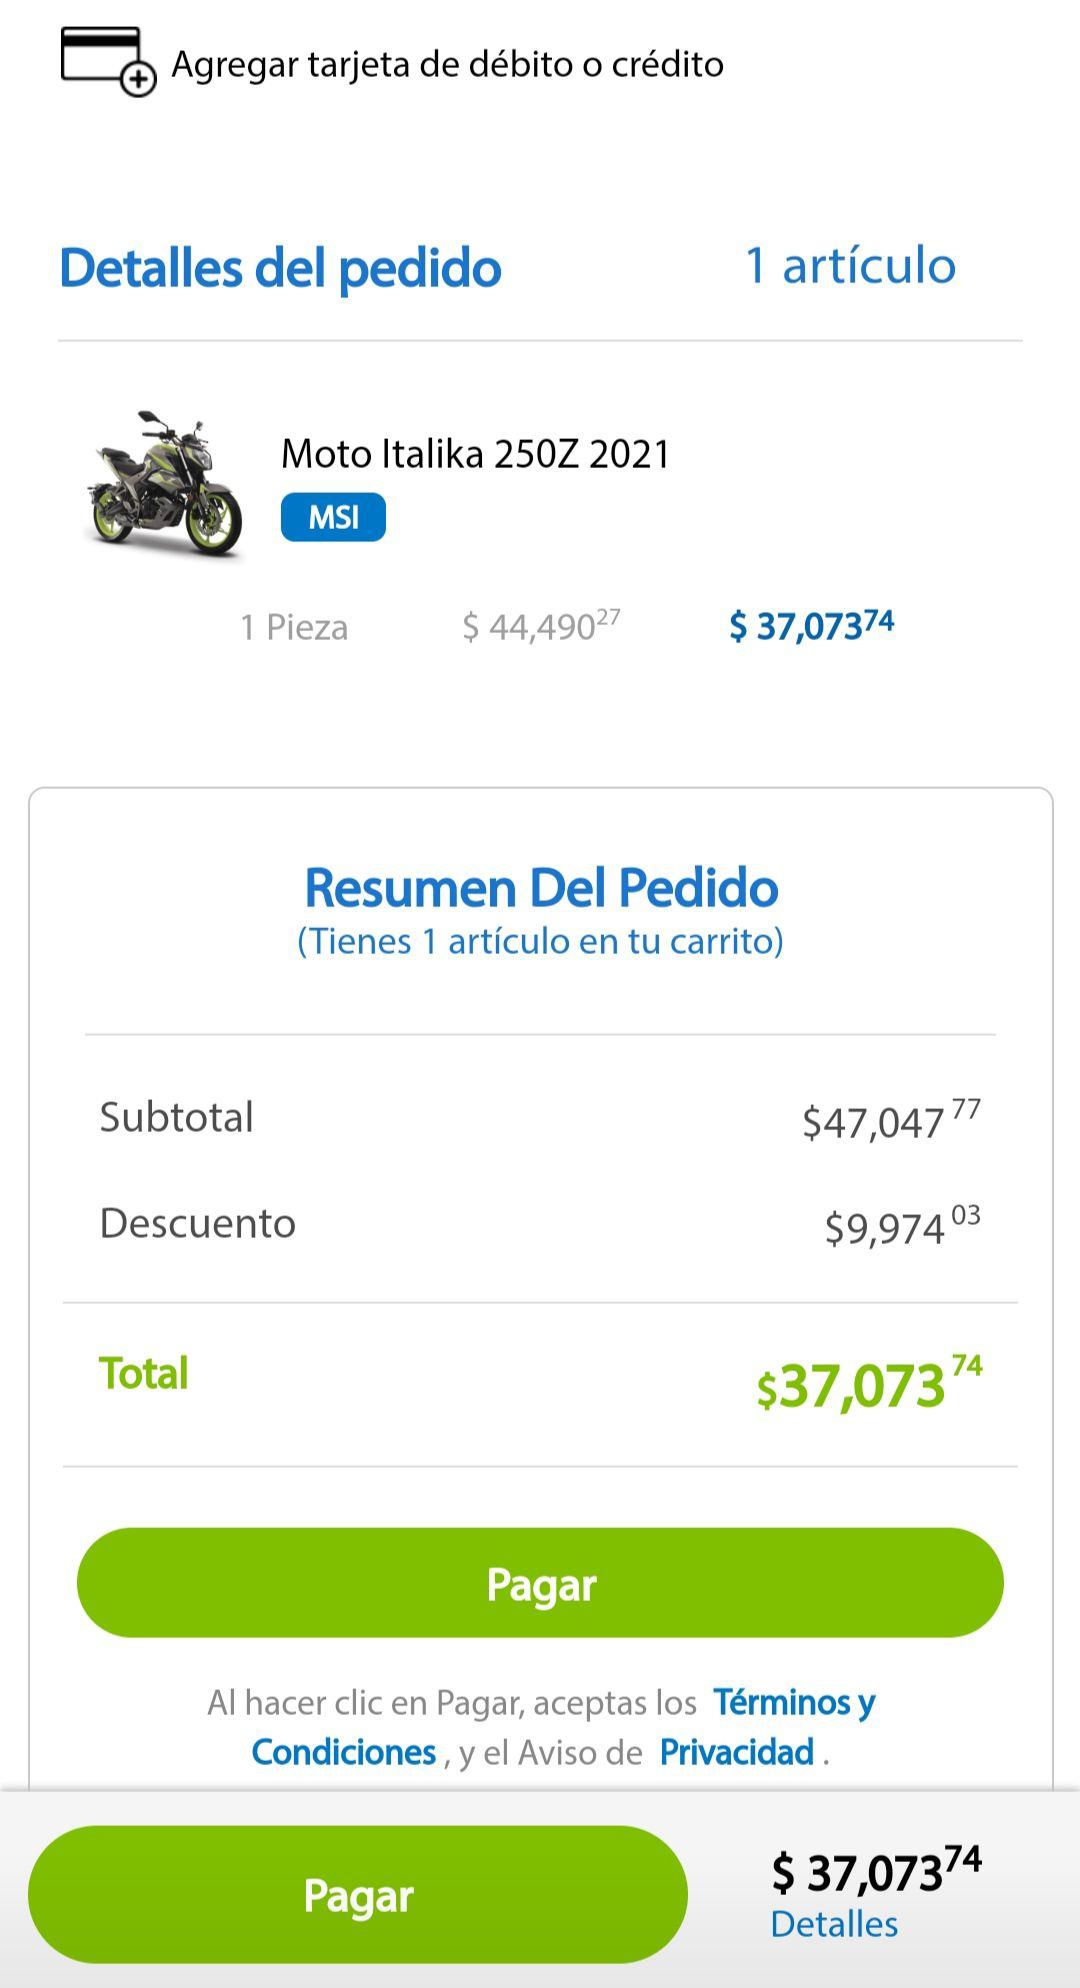 Sam's Club: Italika 250z 18 meses 3 mensualidades de ahorro hot days (Tarjetas participantes) 34573.74 con 15% de BBVA